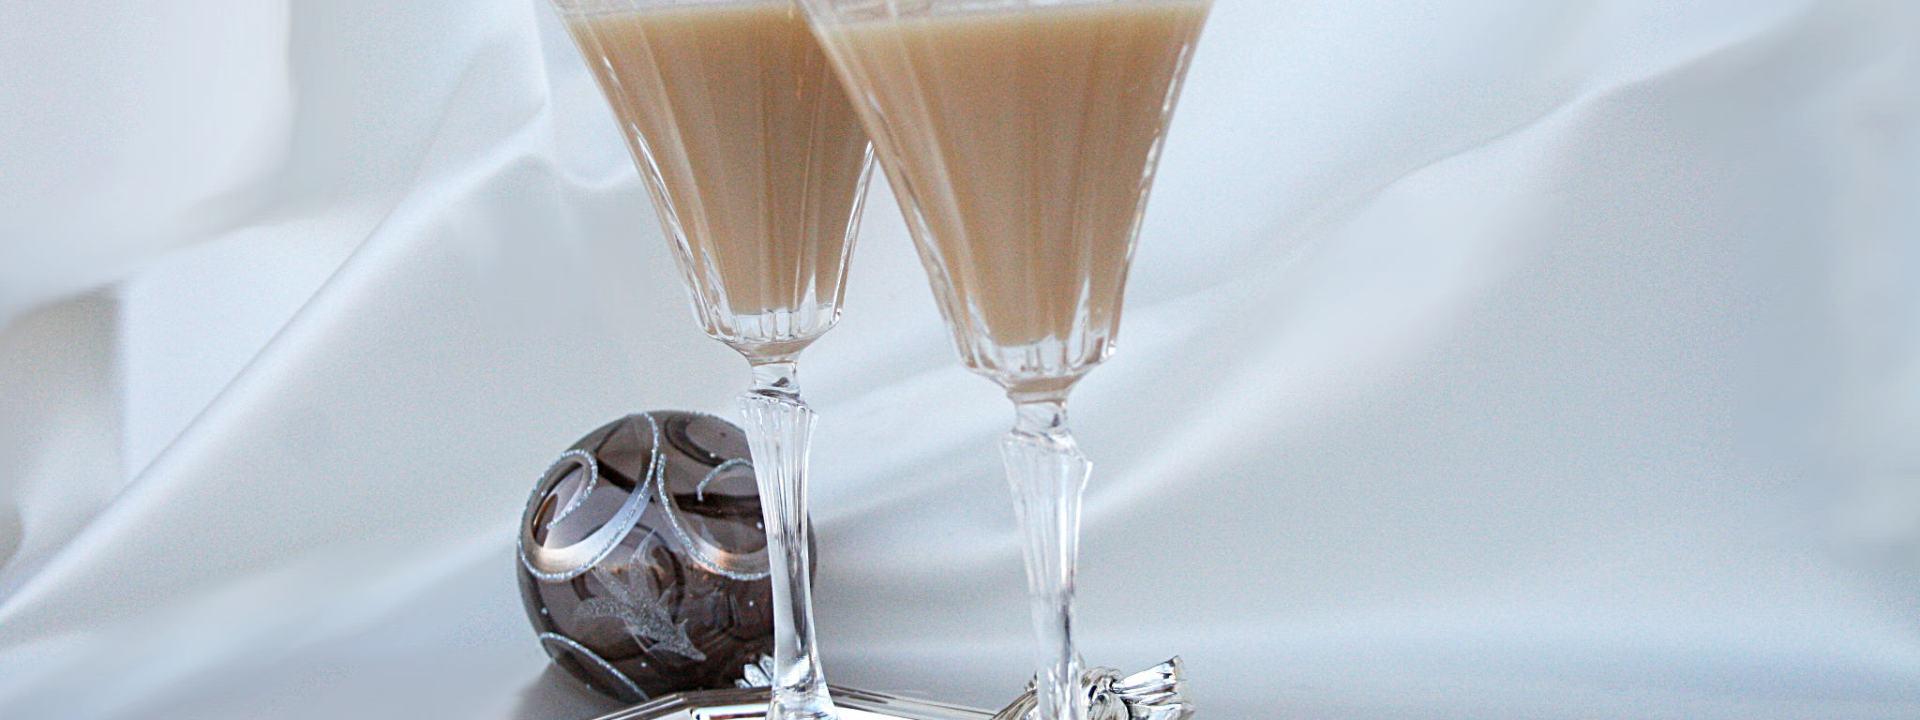 The Fairy Godmother Chocolate Martini